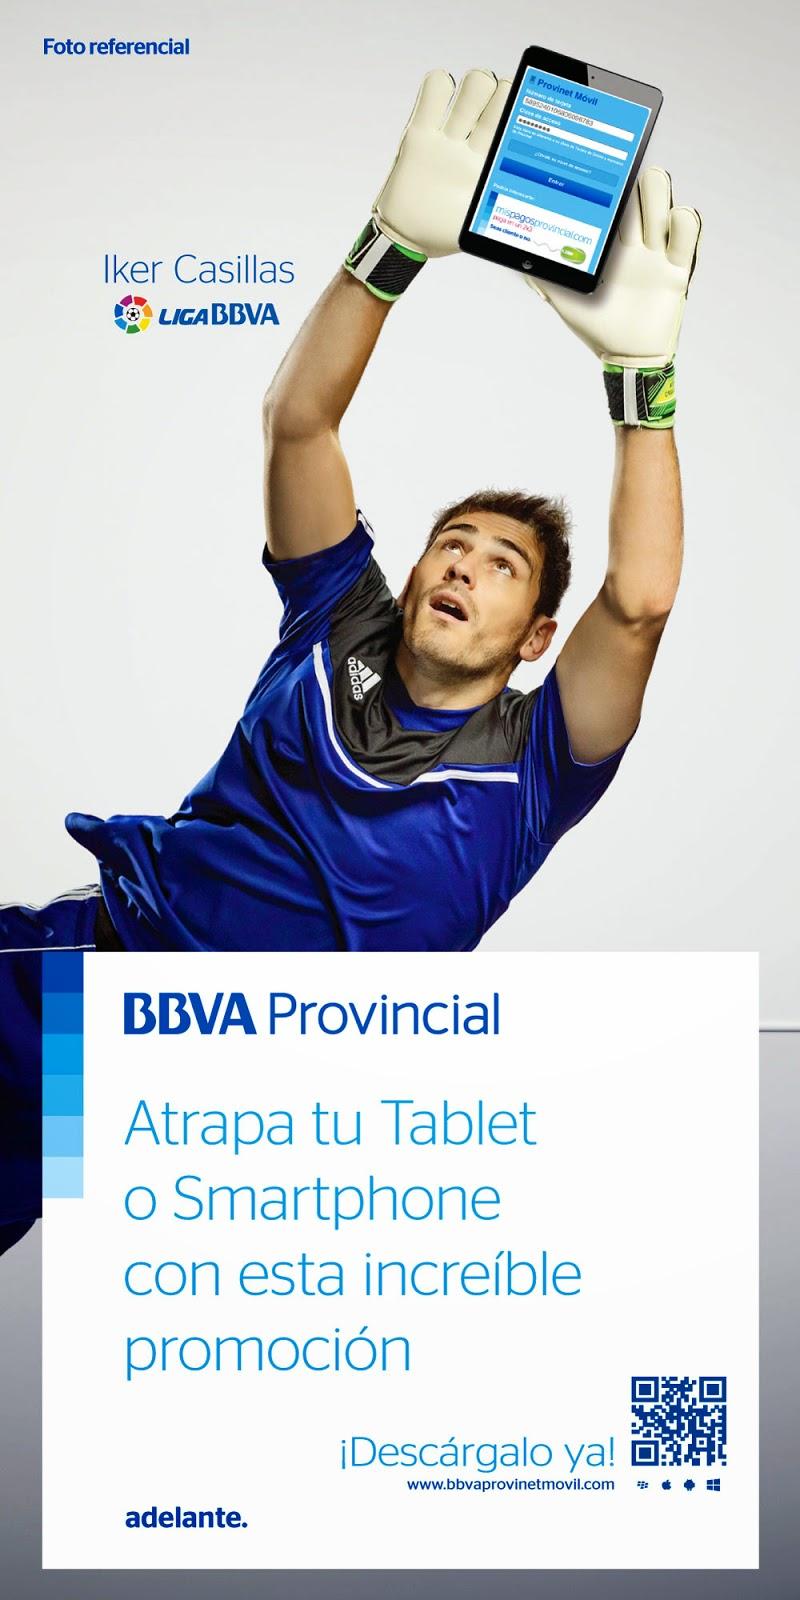 BBVA Provincial, Provinet, Promocion, Tablet, Smartphone